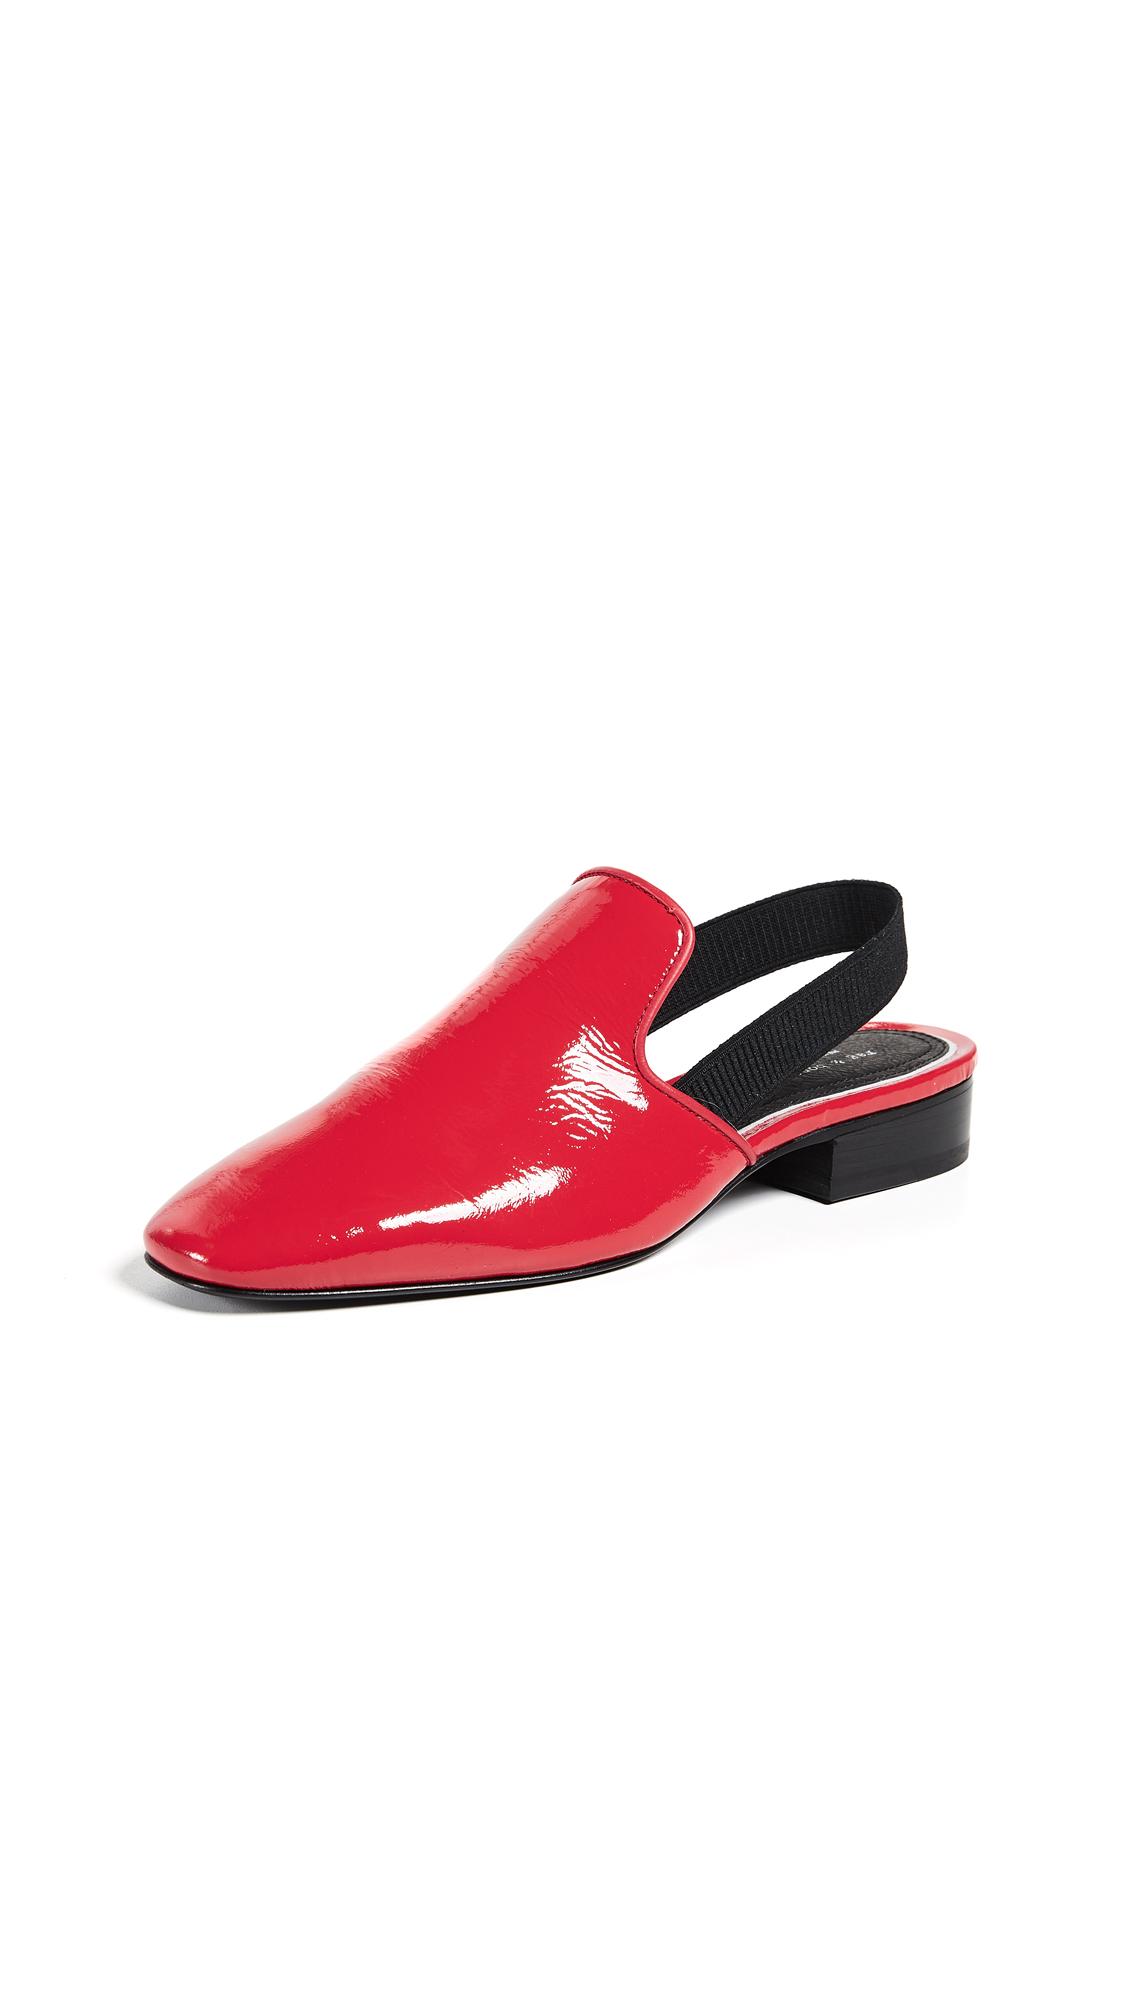 Rag & Bone Luis Slingback Flats - Red